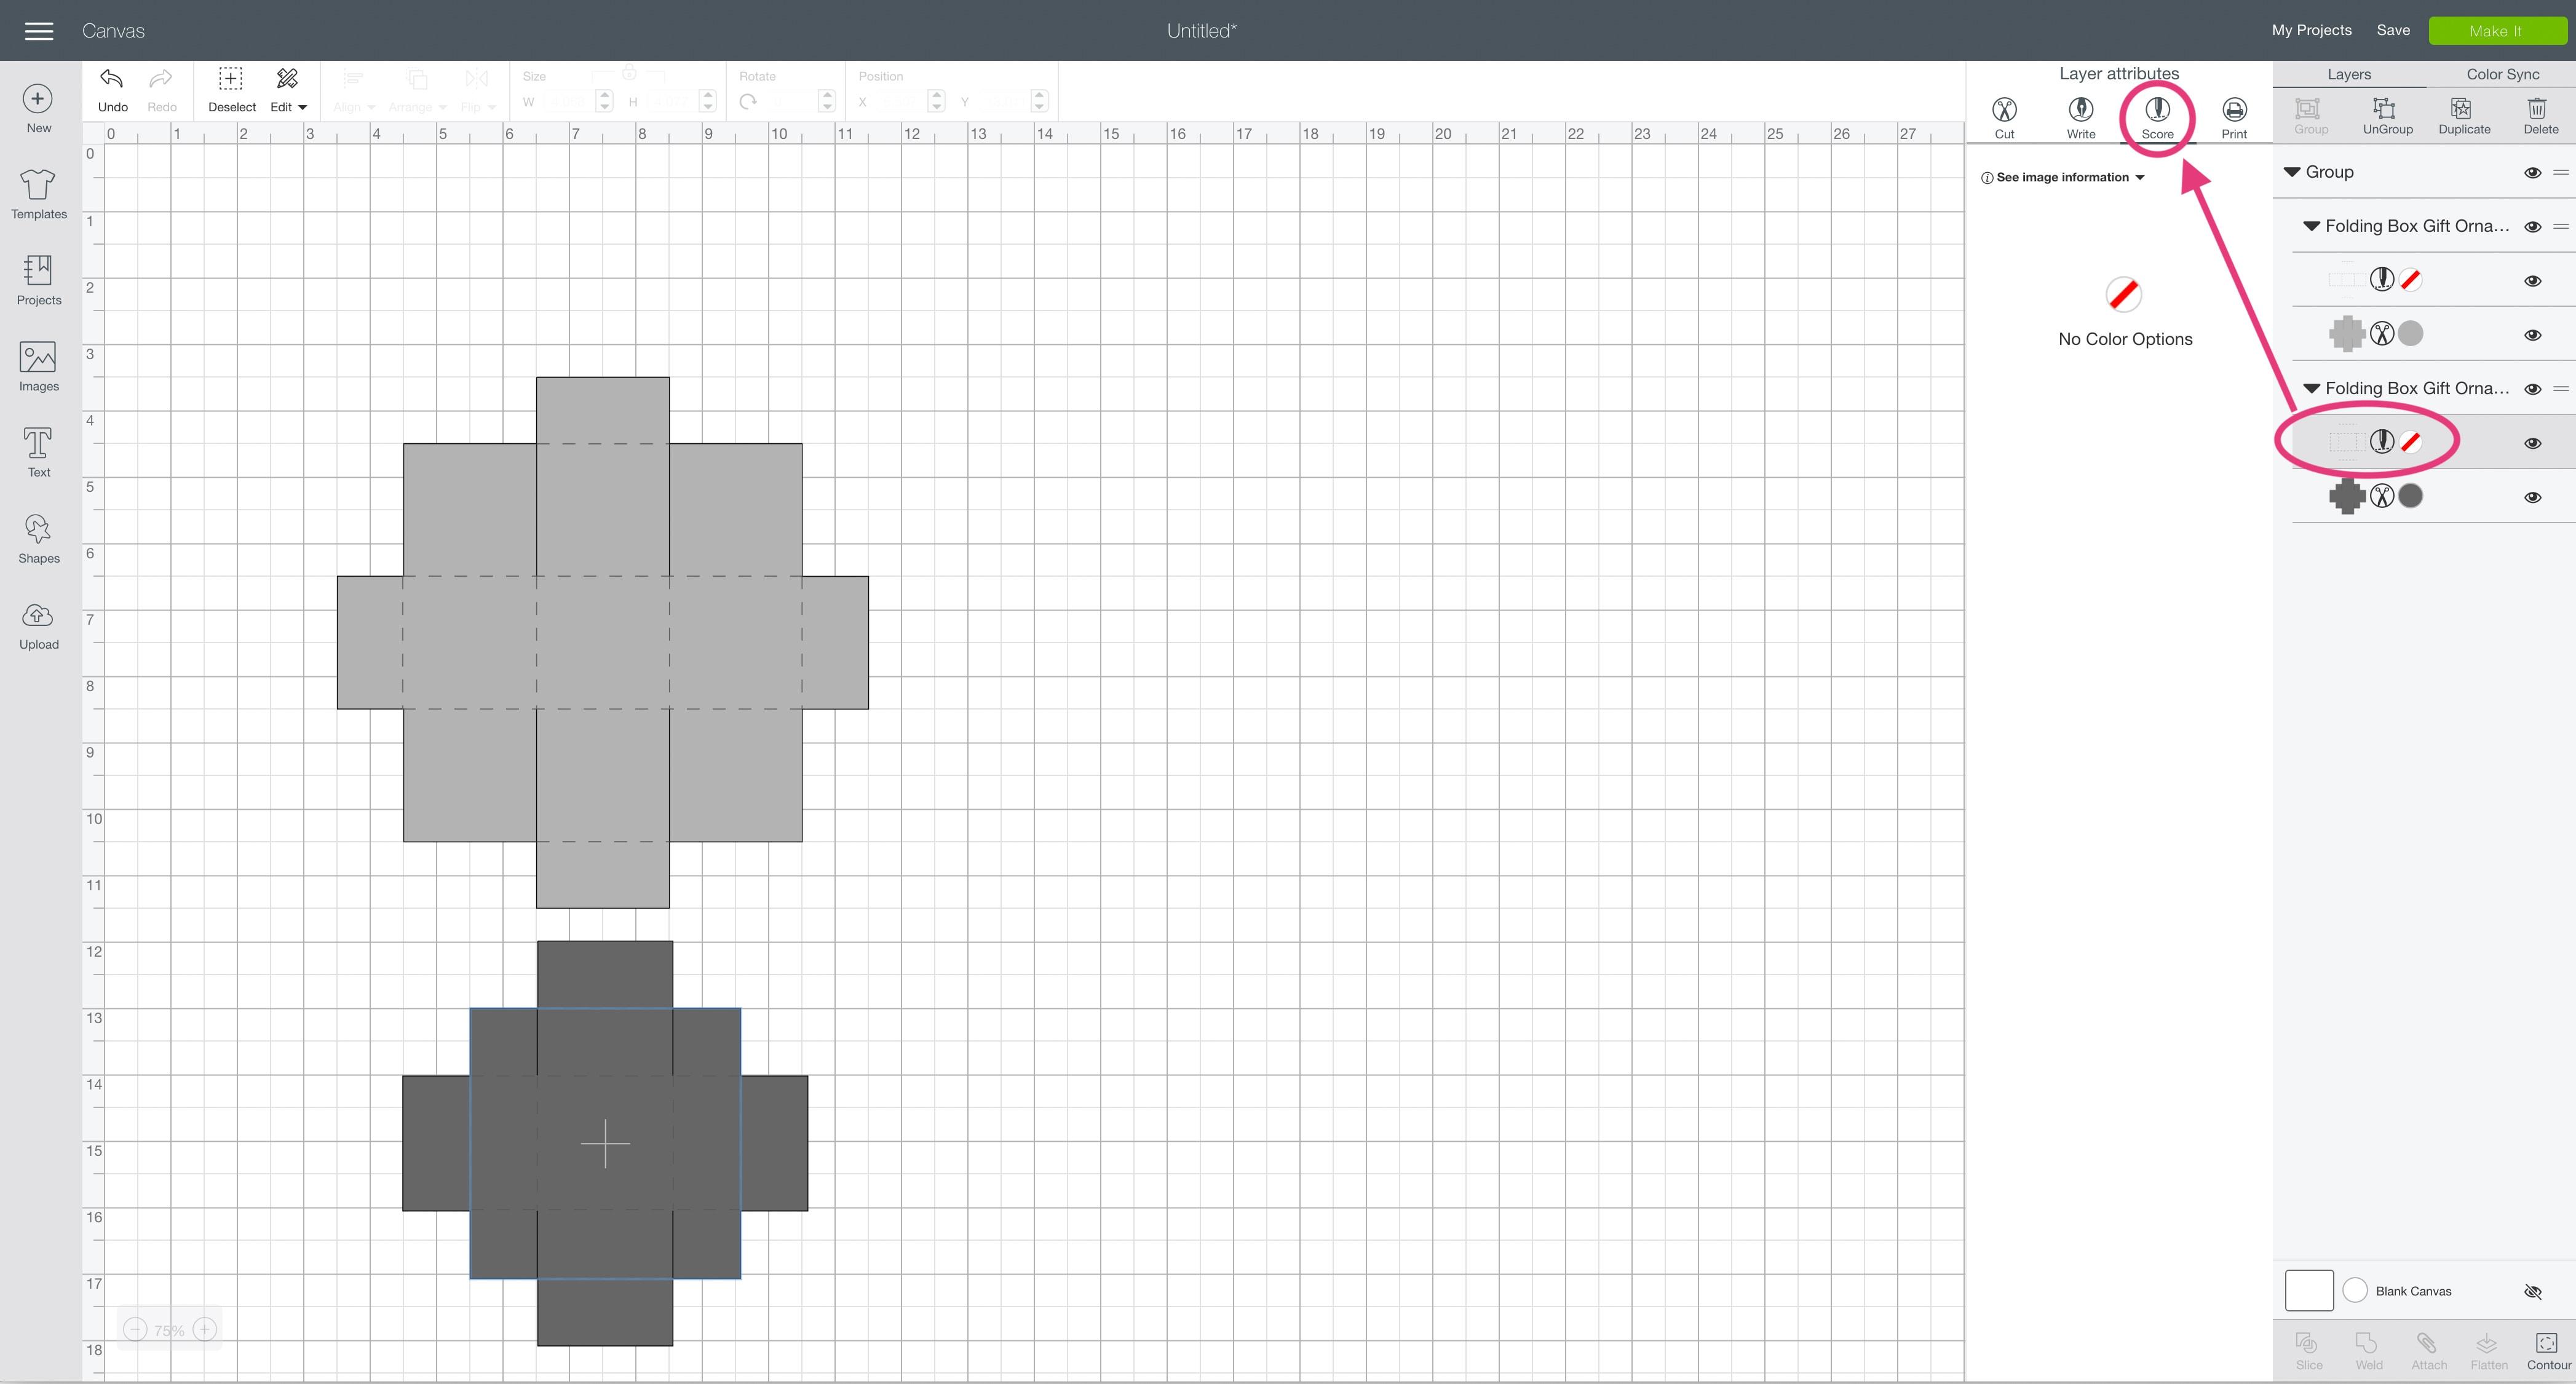 score layer attributes lid Cricut Design Space folding box gift ornament